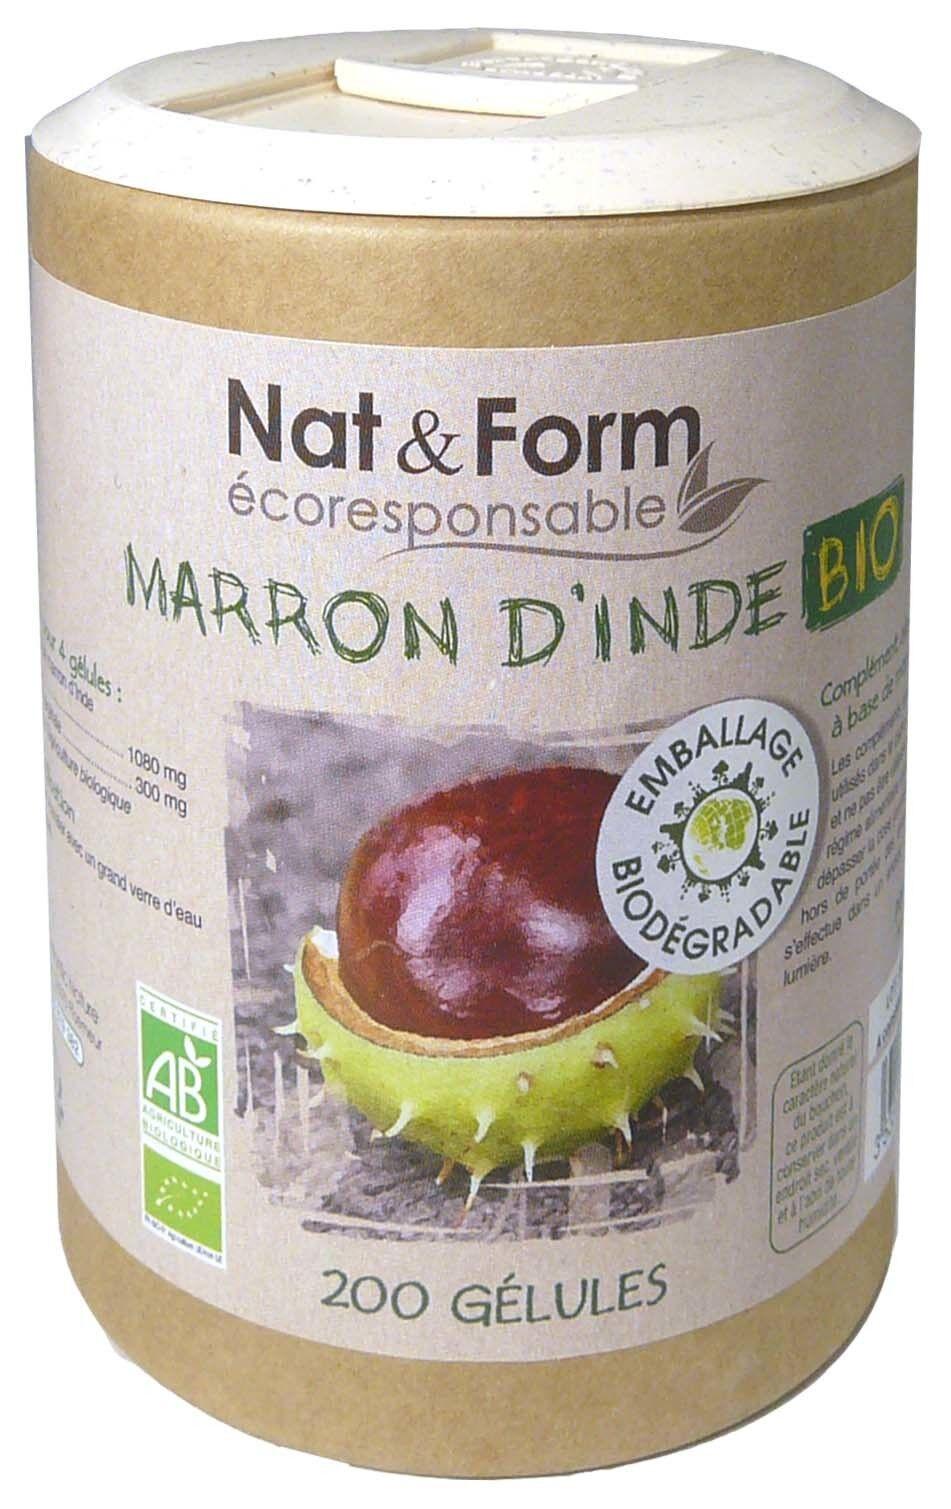 Nat & form marron d'inde bio 200 gelules